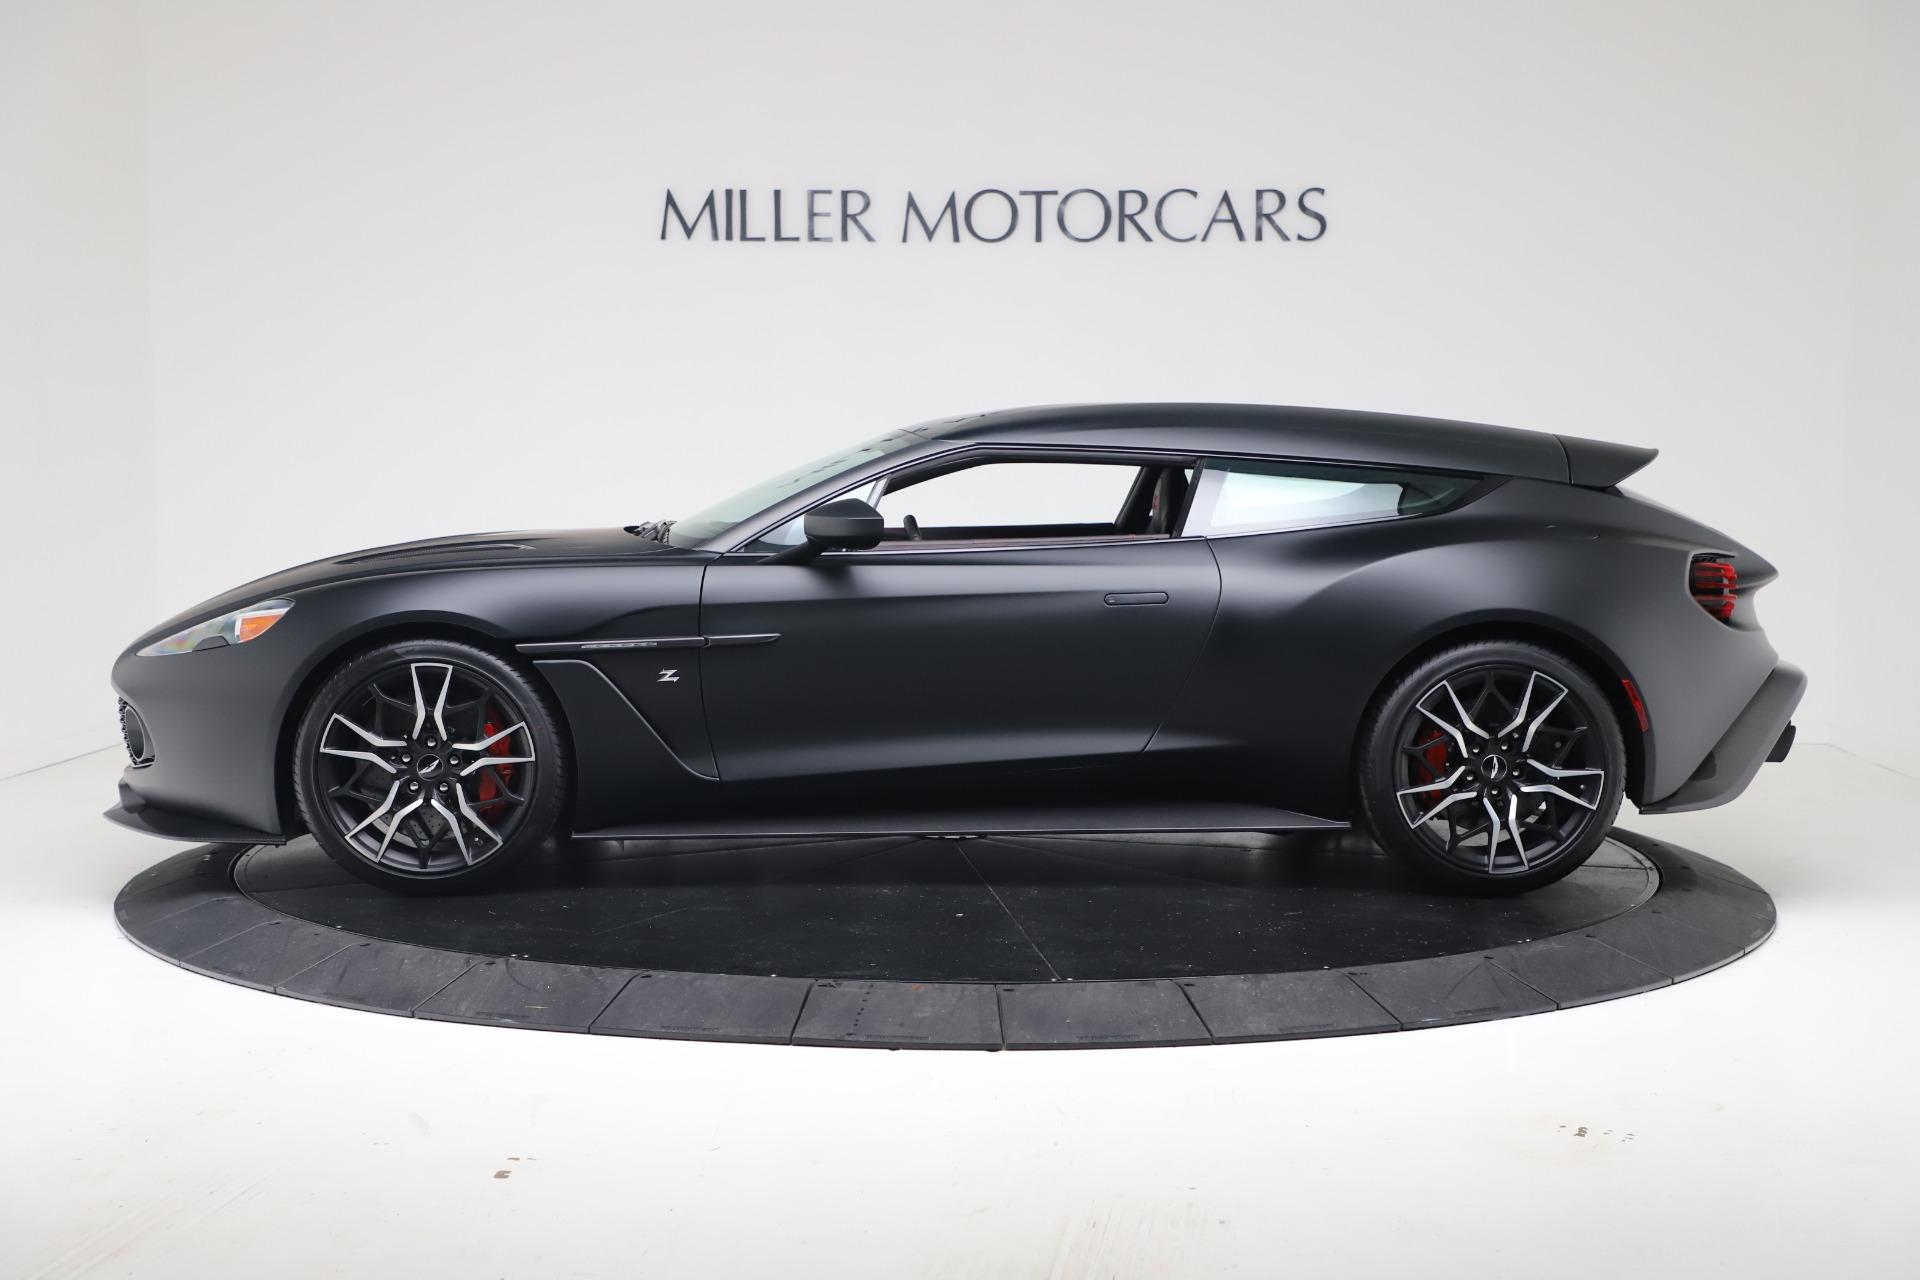 New 2019 Aston Martin Vanquish Shooting Brake For Sale In Westport, CT 3512_p3